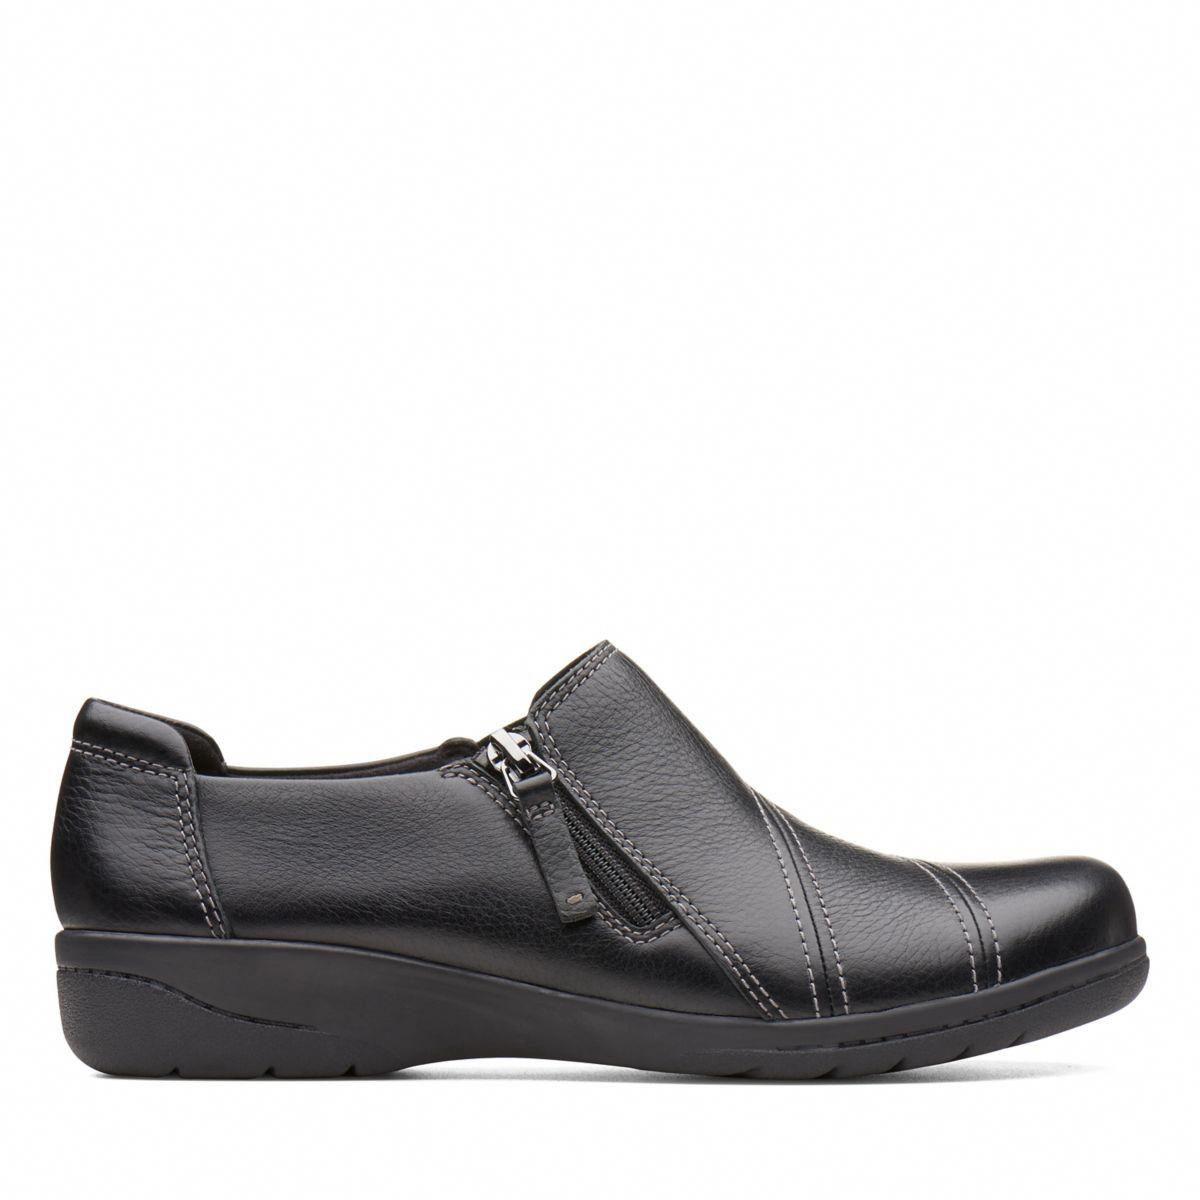 1ff8a46cca4 Clarks Cheyn Clay - Womens Shoes Black Leather 6.5 D (Medium)  womensshoes